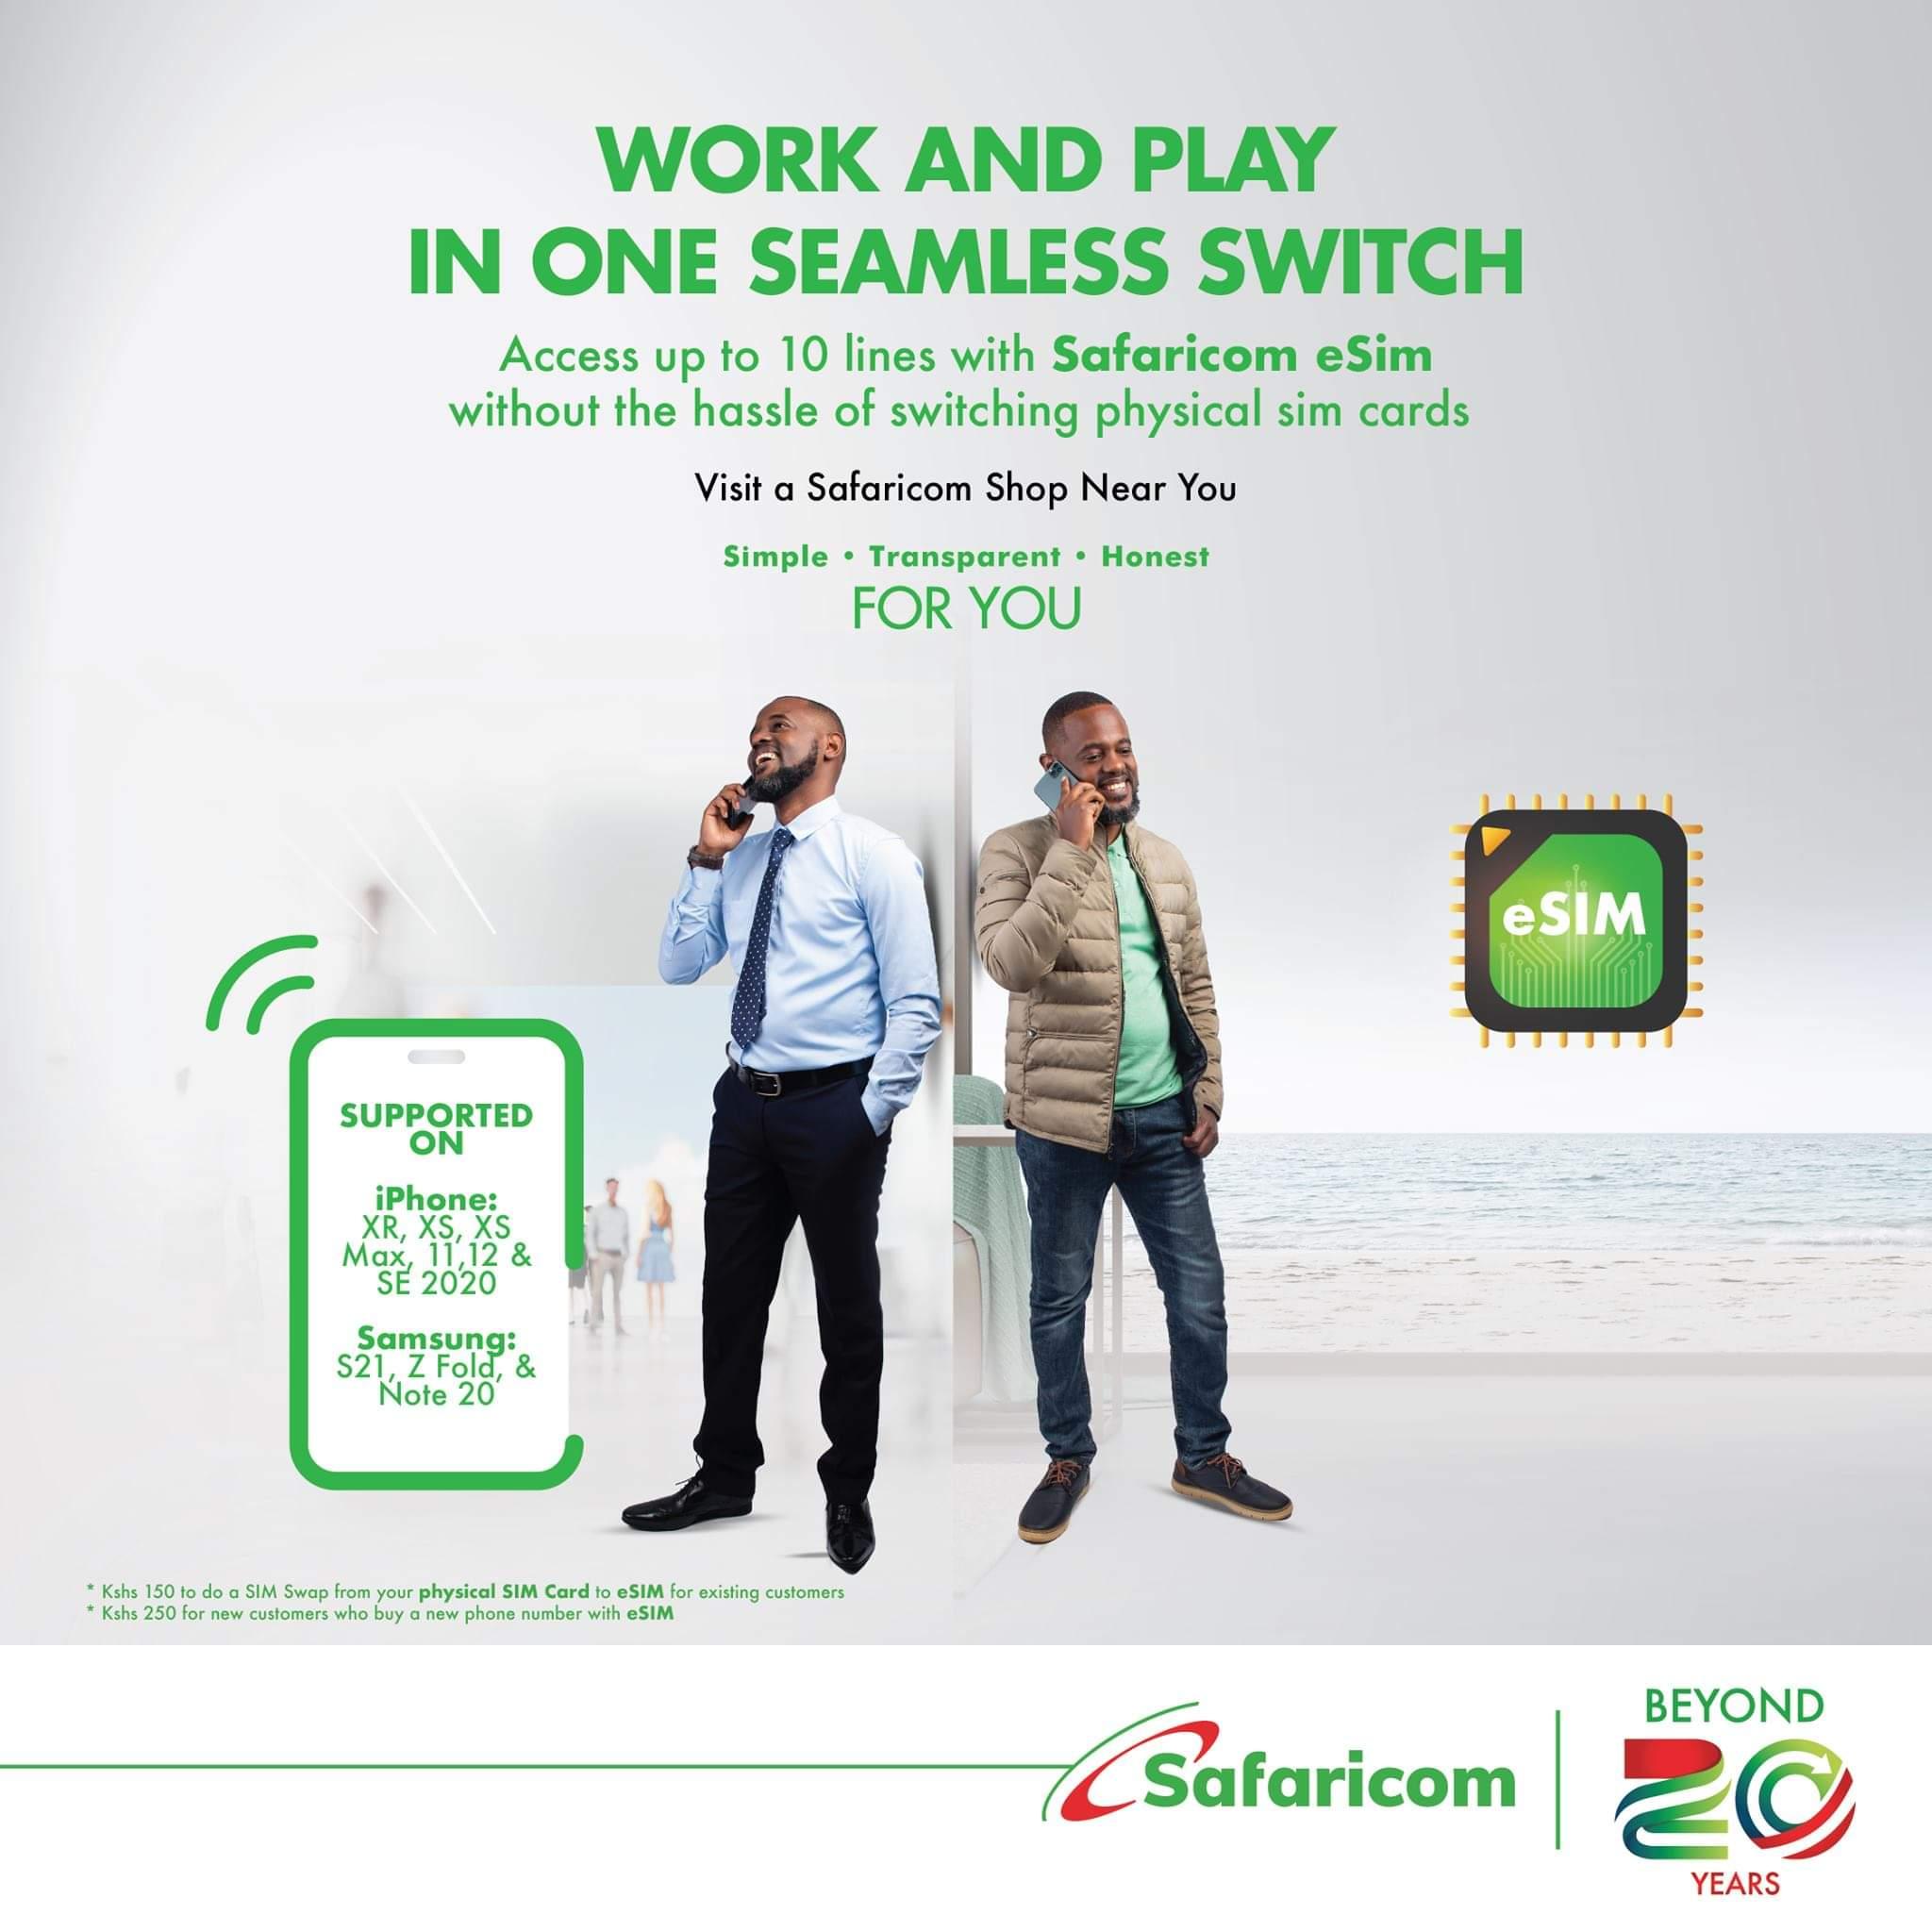 Safaricom eSIM